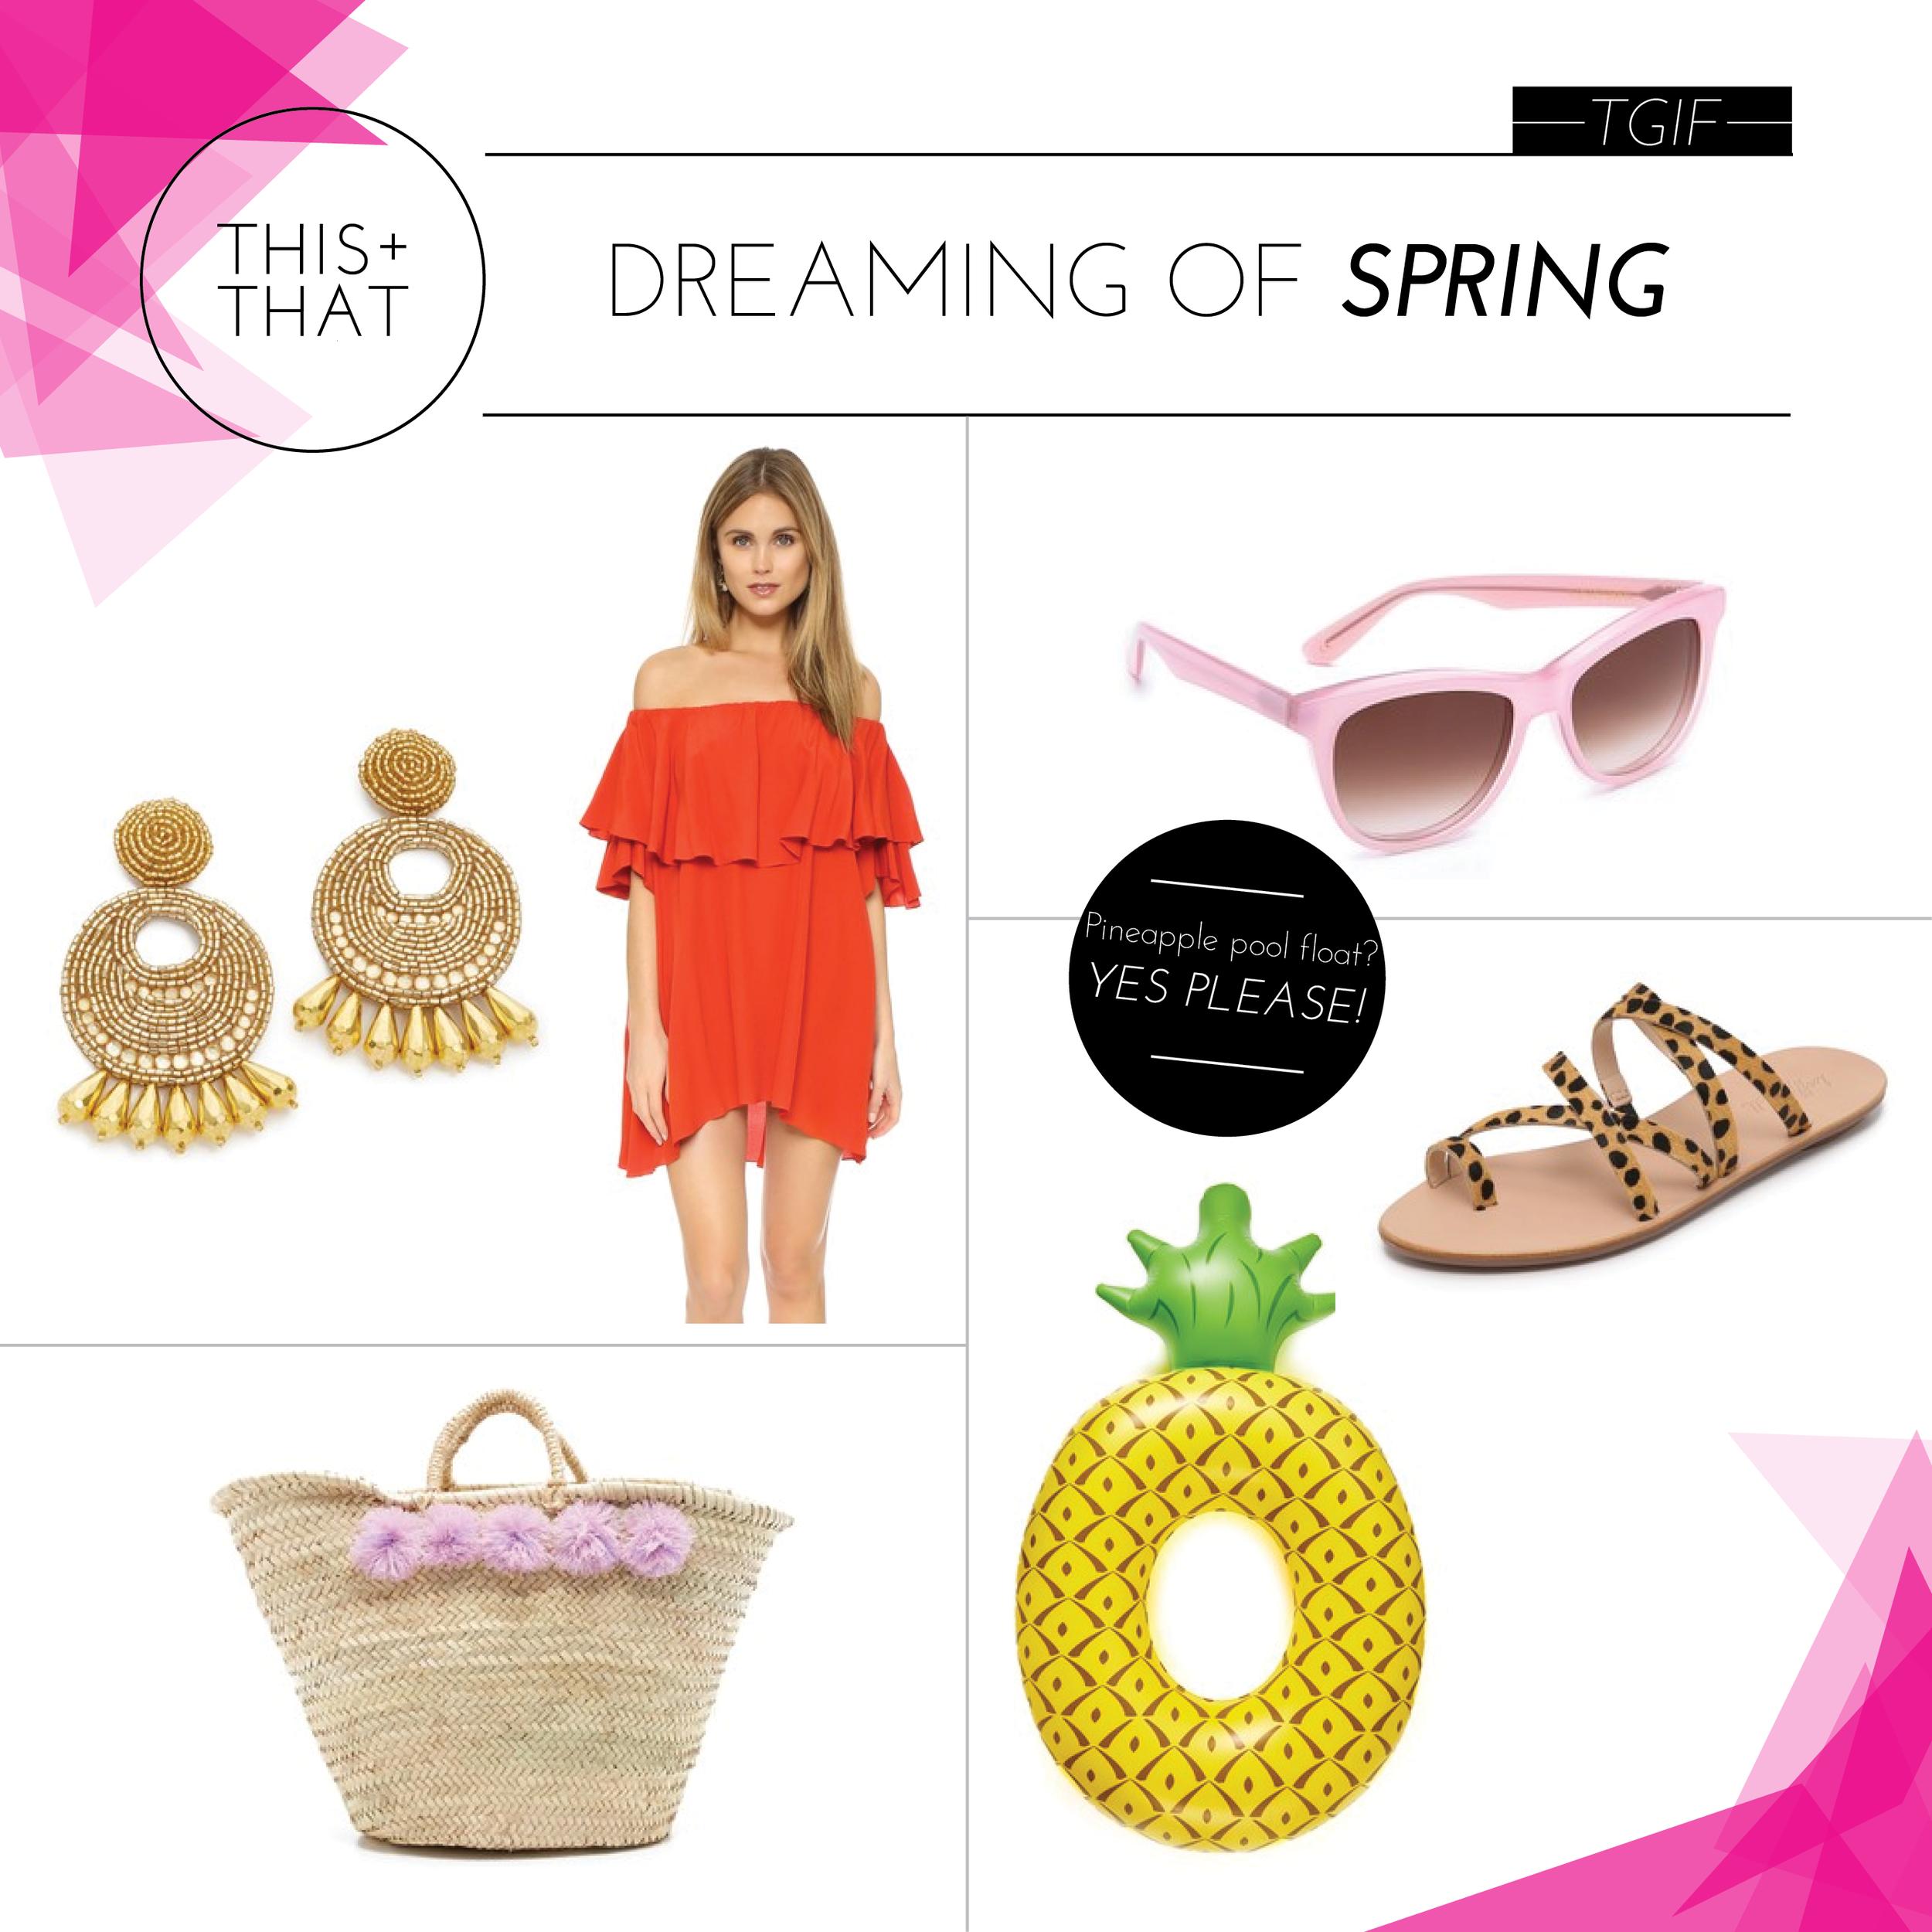 SHOP TGIF (CLOCKWISE)     EARRINGS  |  DRESS  |  SUNNIES  |  SANDALS  |  FLOAT  |  BAG